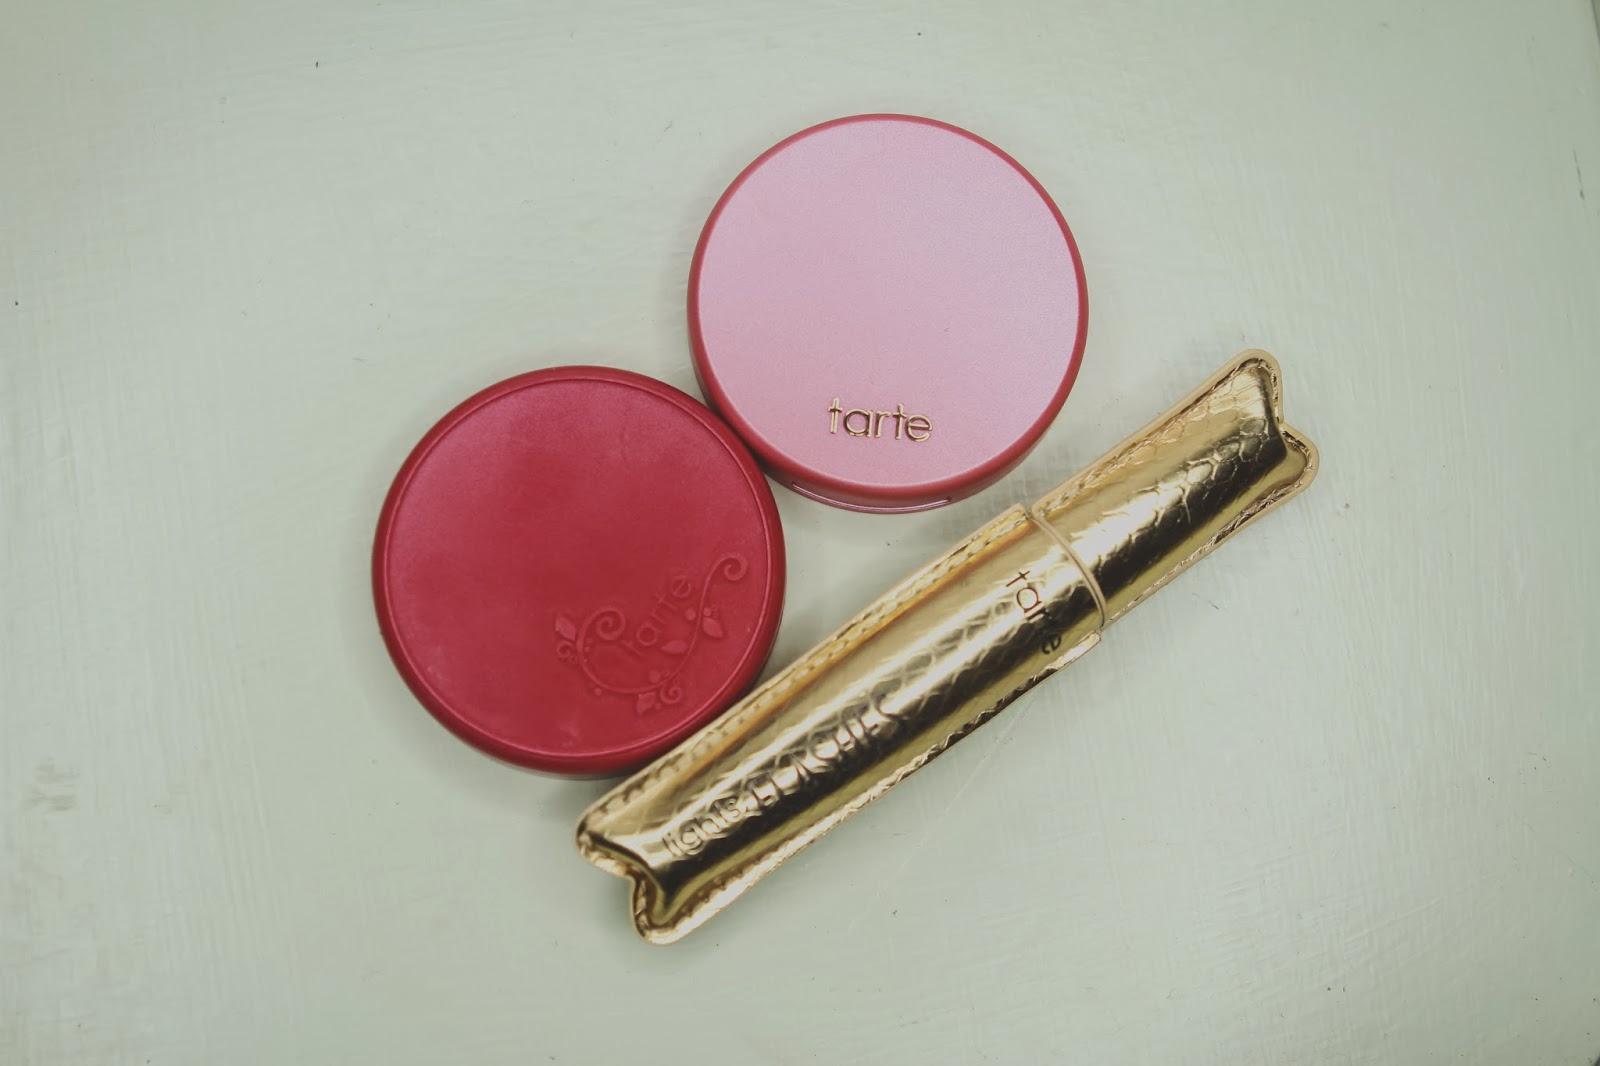 tarte Favorite Brands: makeup Tarte The in natural Disguise: Geek  Cosmetics brands